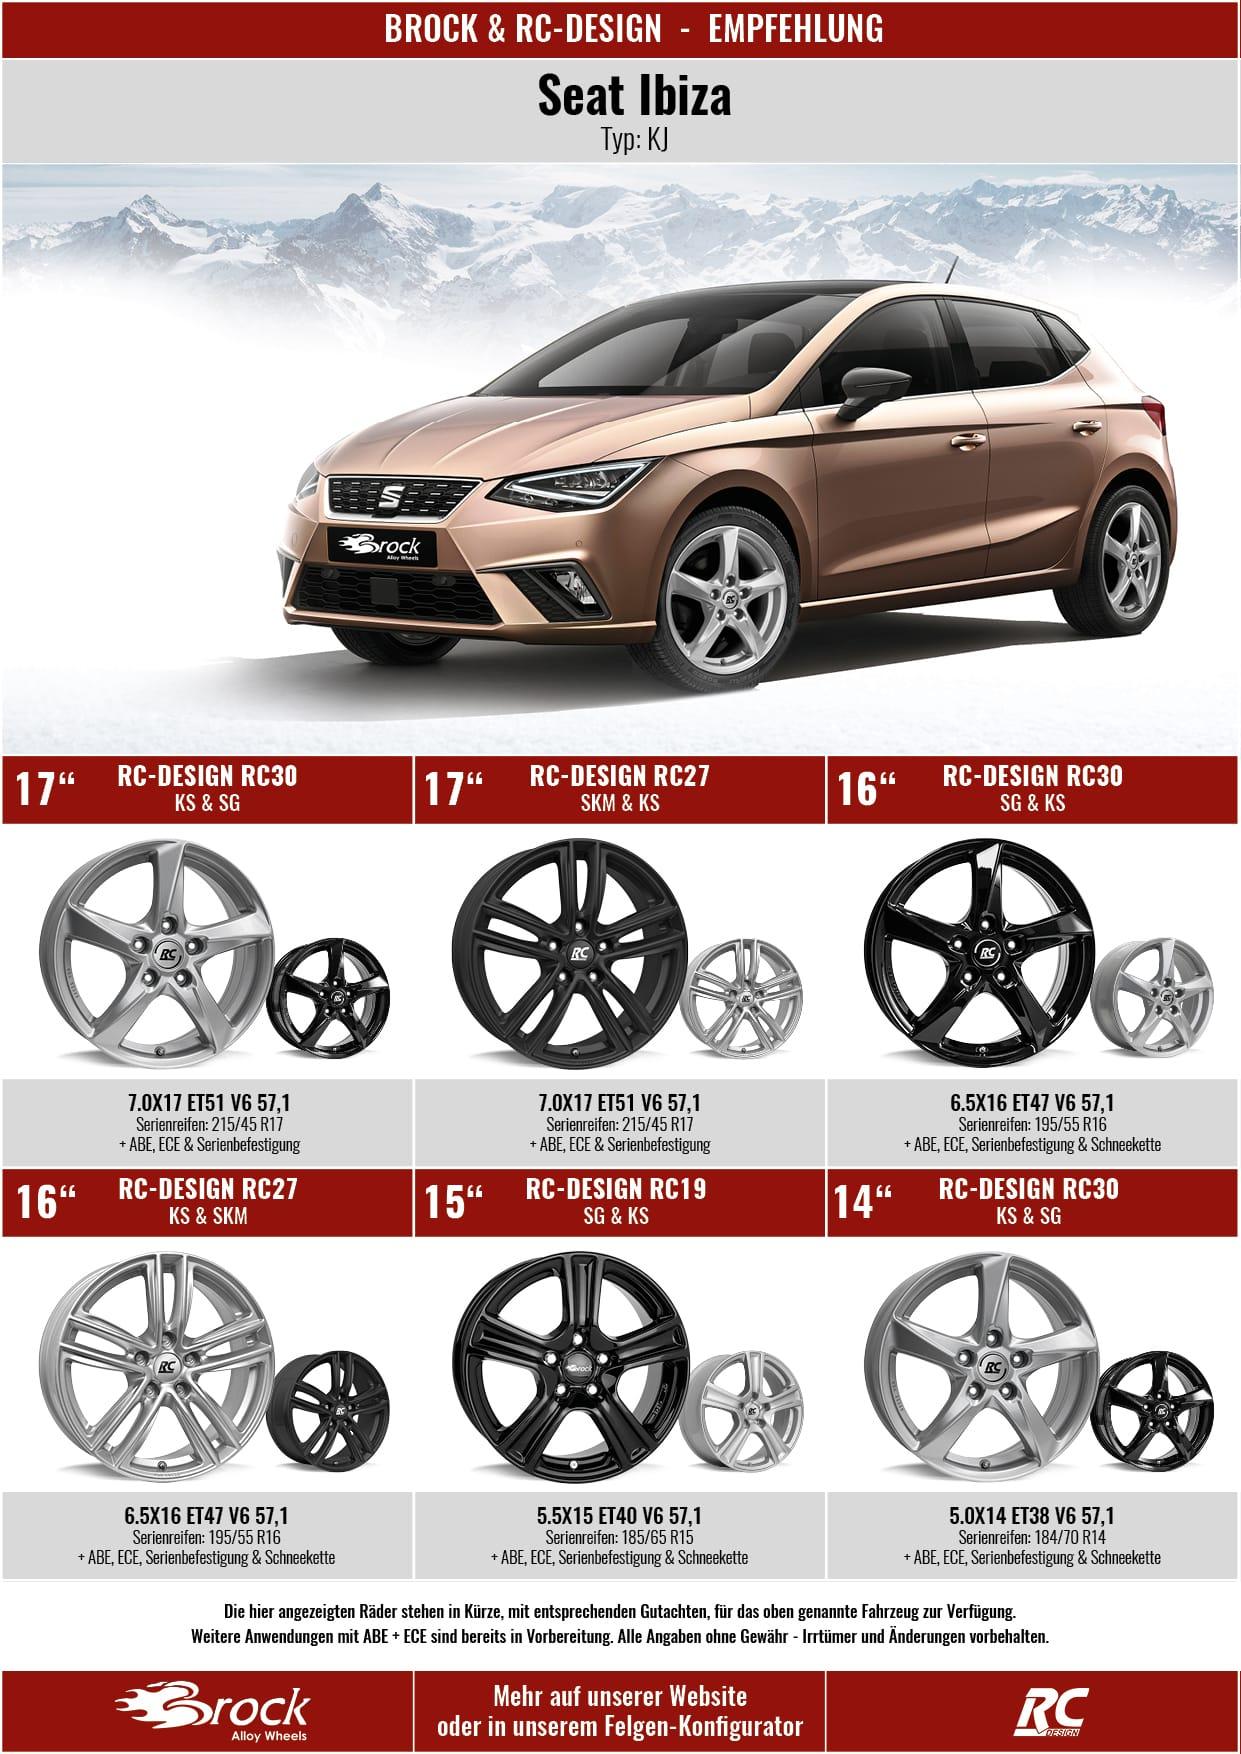 Empfehlung Seat Ibiza KJ ECE Felgen